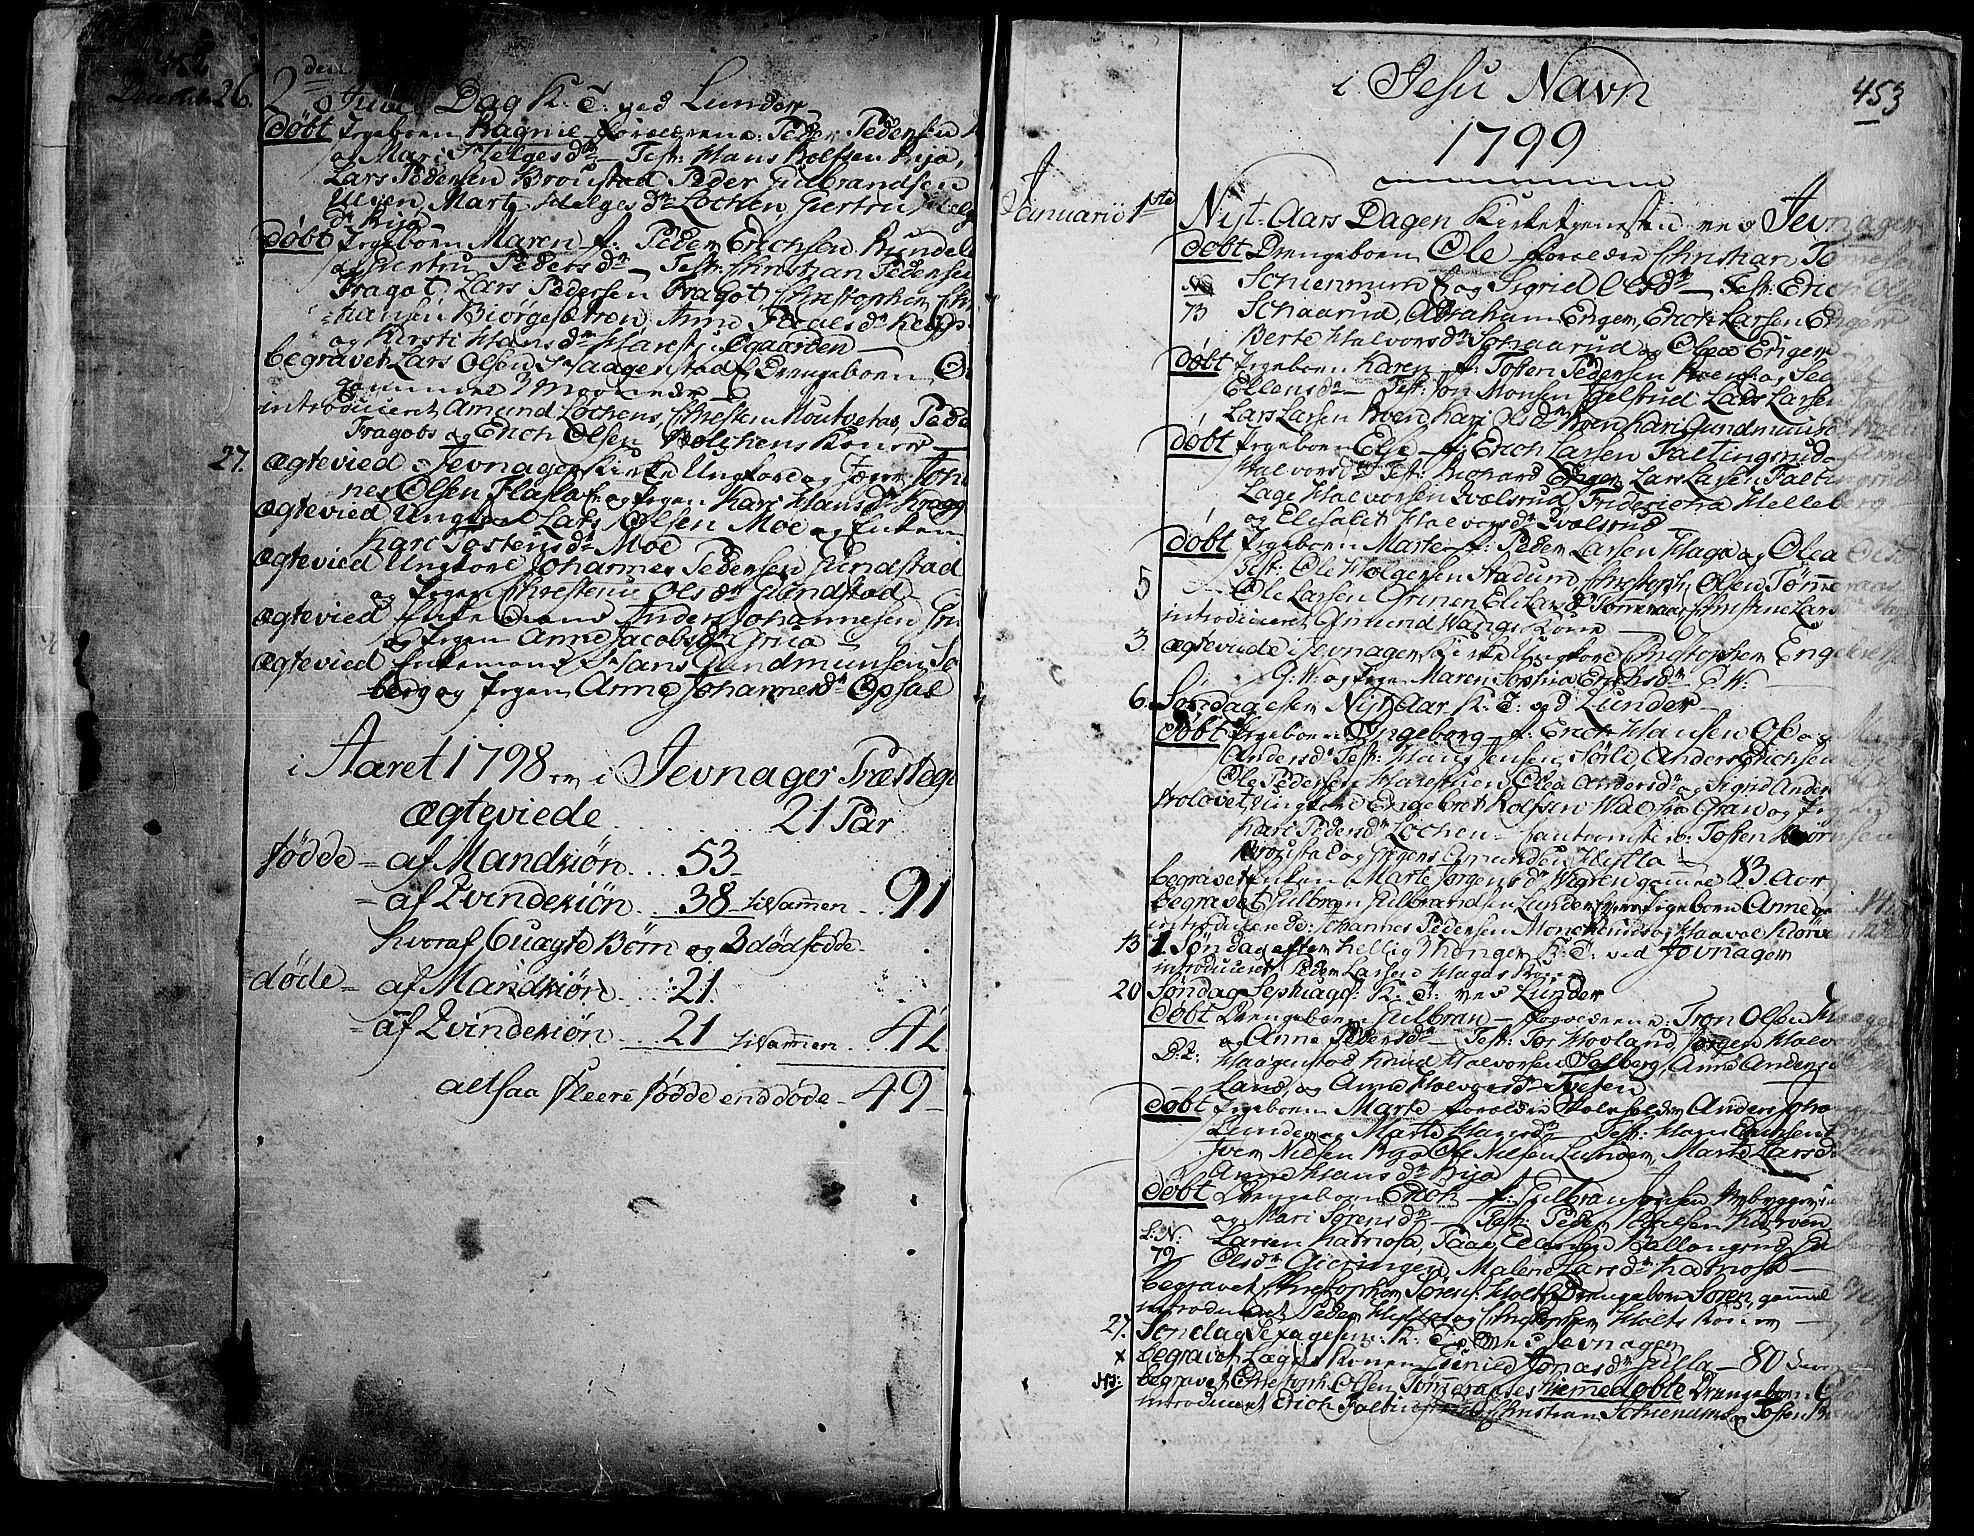 SAH, Jevnaker prestekontor, Ministerialbok nr. 3, 1752-1799, s. 452-453